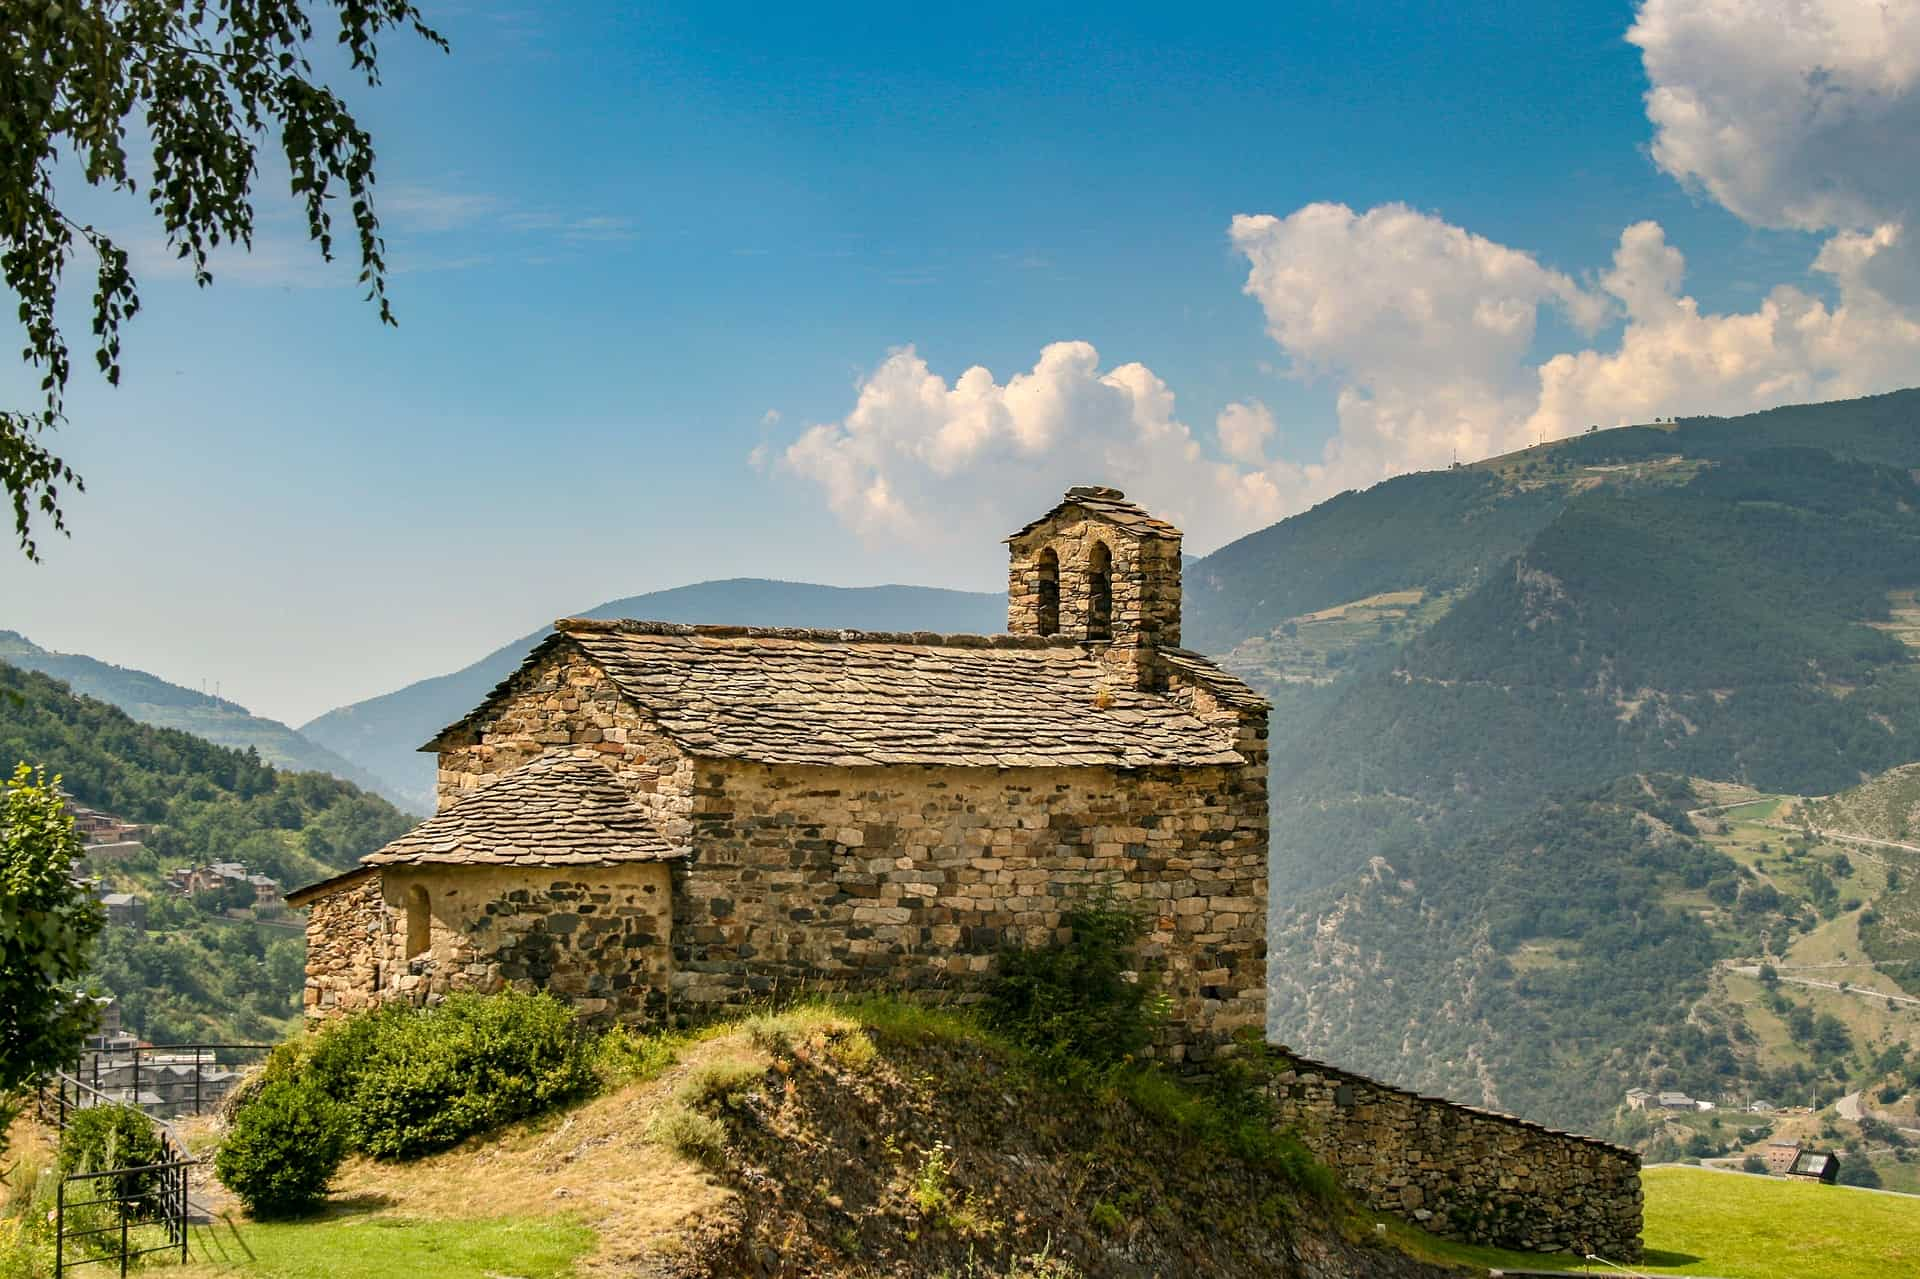 A church on a hillside in Andorra